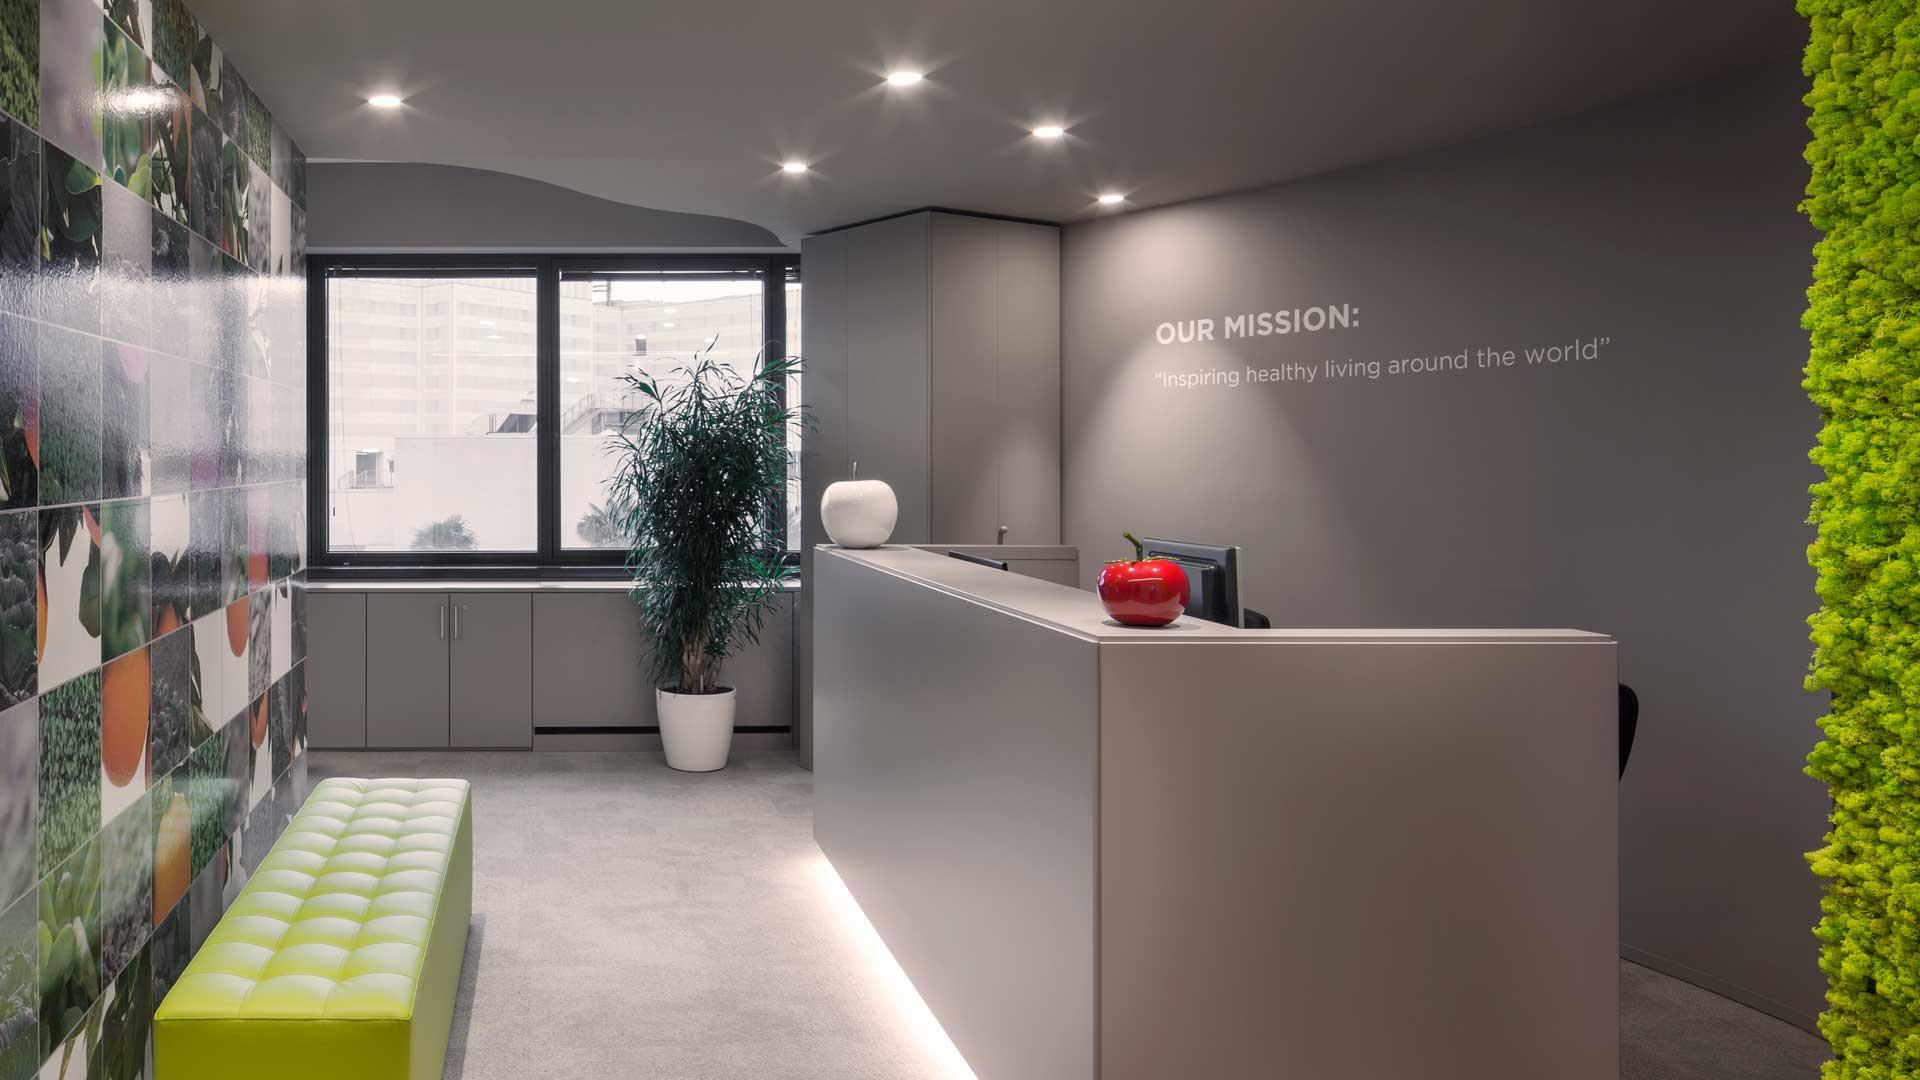 Uffici-per-e-commerce-Juice-Plus-4-Level-Office-Landscape